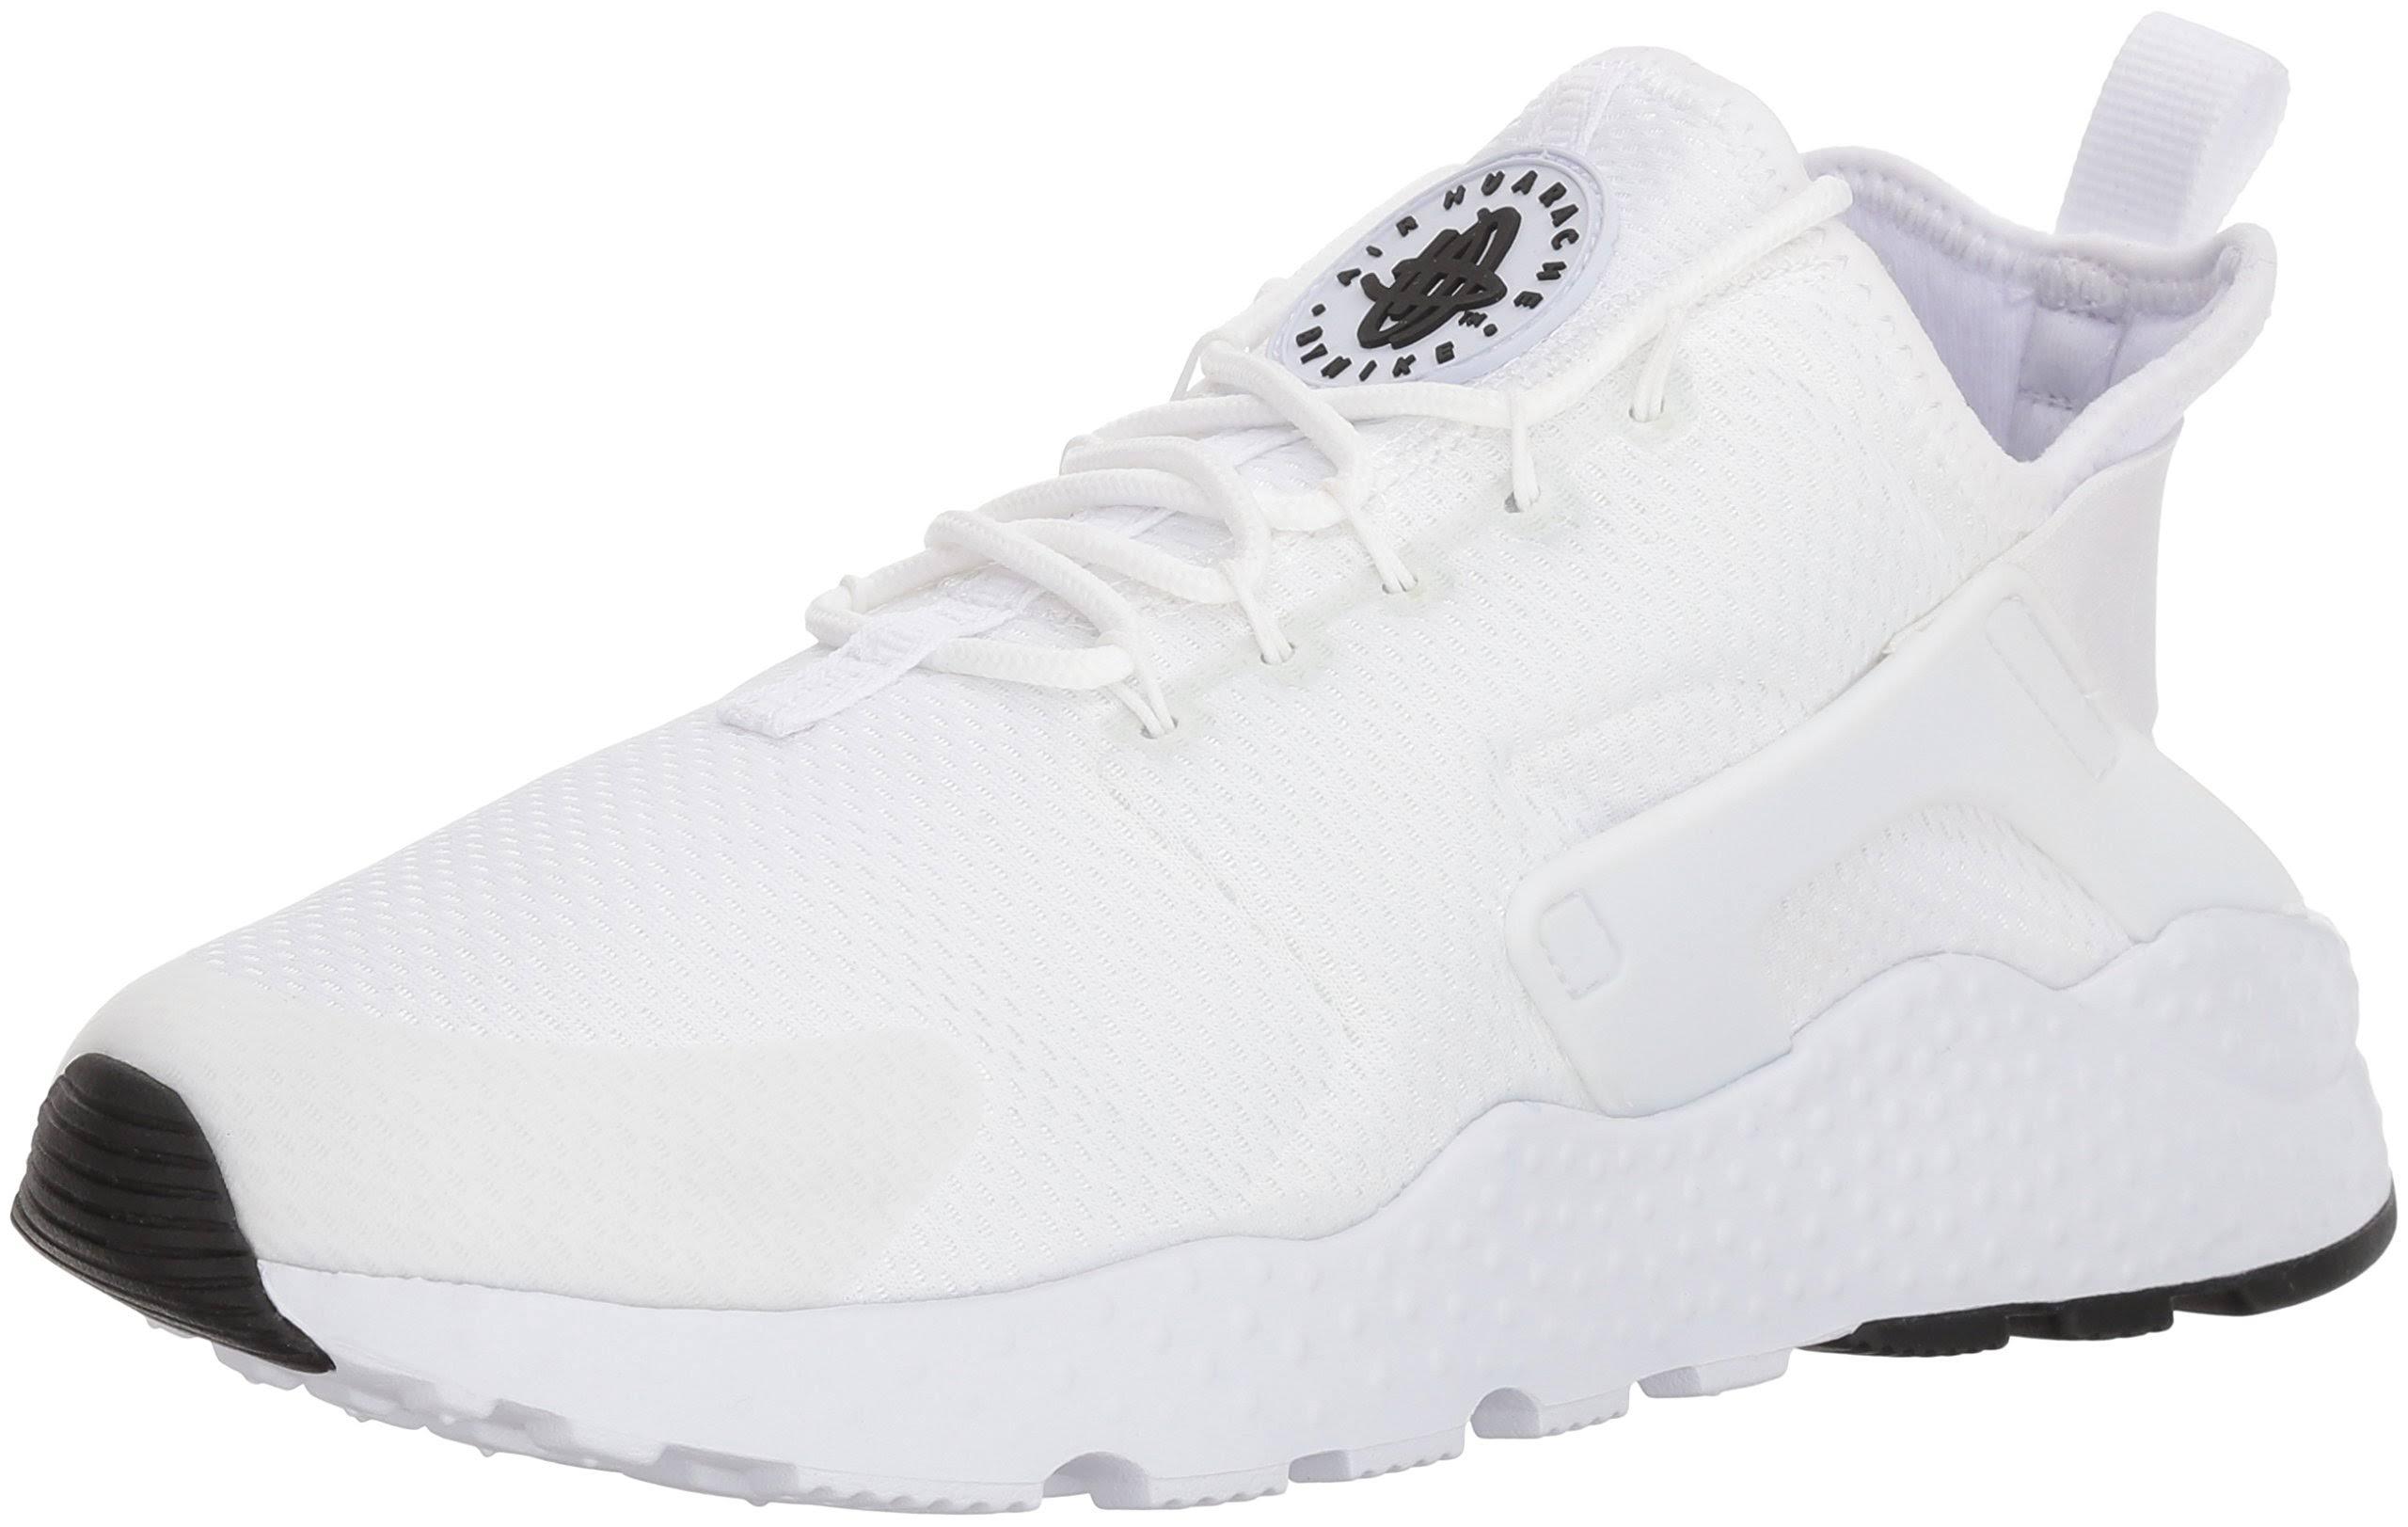 B Huarache Nike Us Weiß Run 5 weiß Laufschuh Air Damen Schwarz m 1F1wR4q